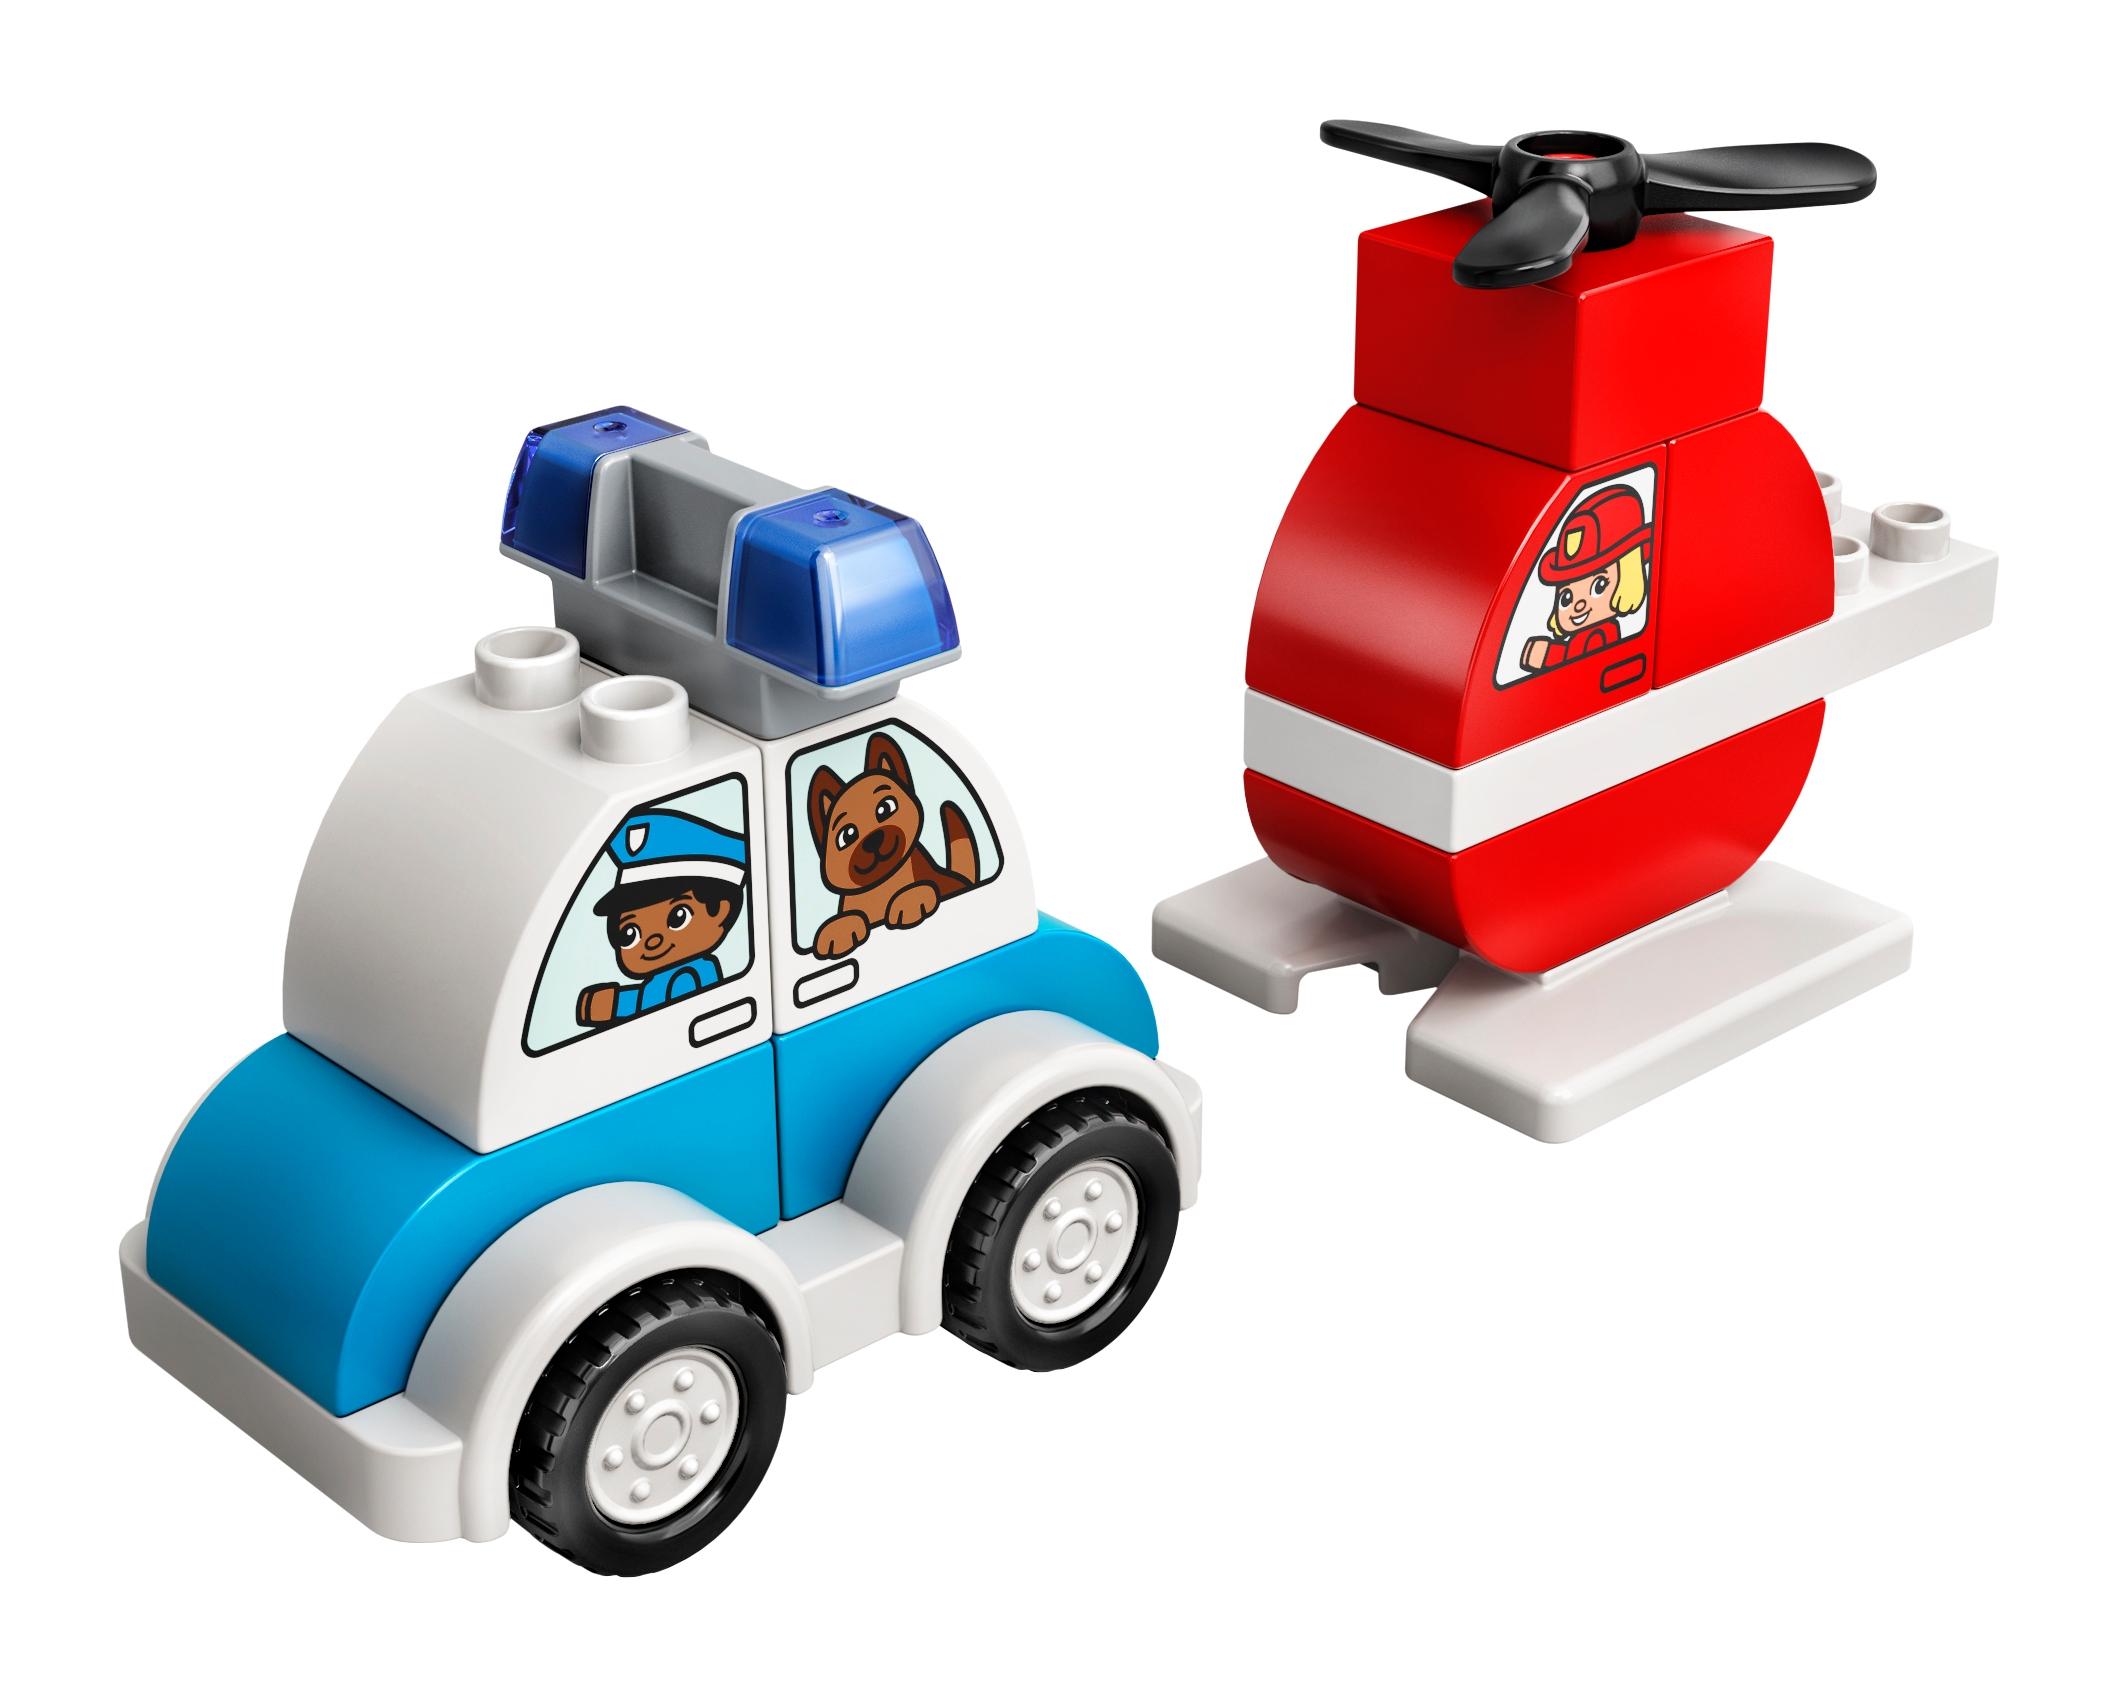 LEGO DUPLO 10957 Brandhelikopter och polisbil